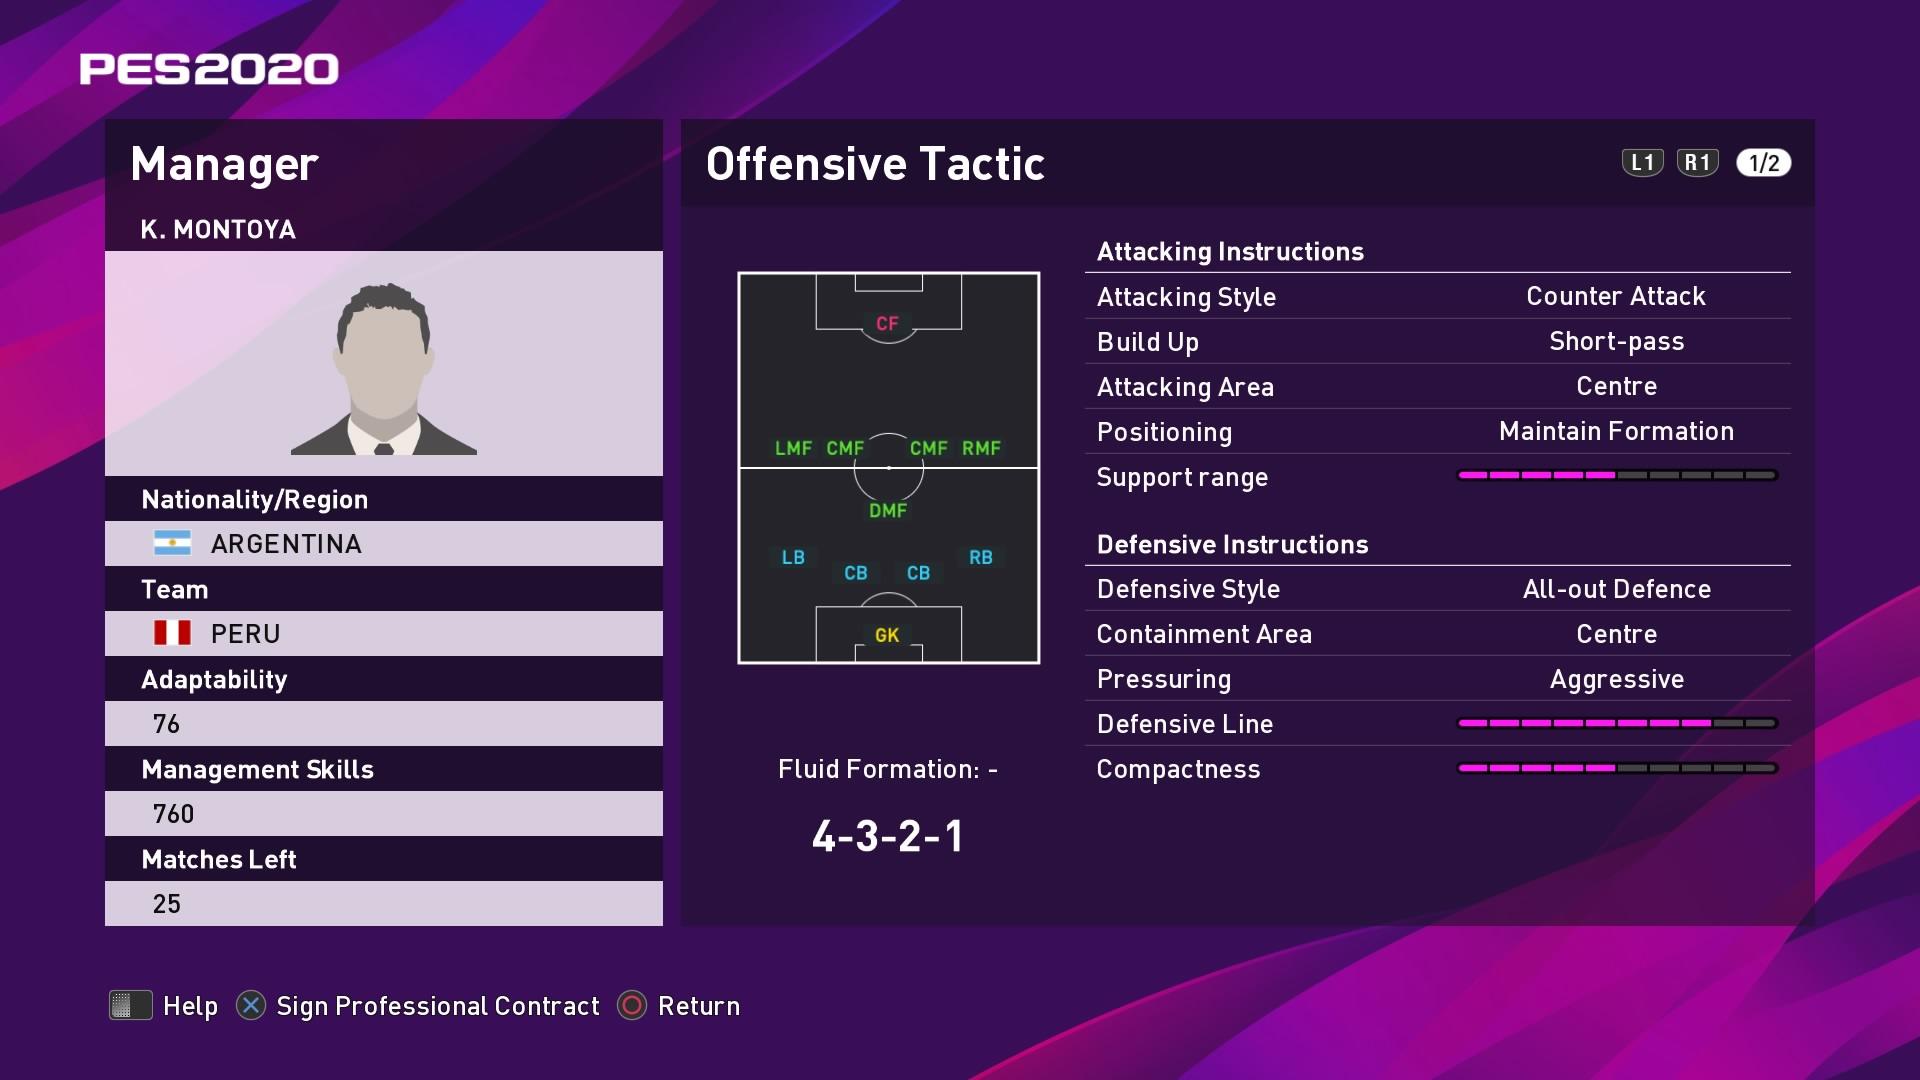 K. Montoya (2) (Ricardo Gareca) Offensive Tactic in PES 2020 myClub